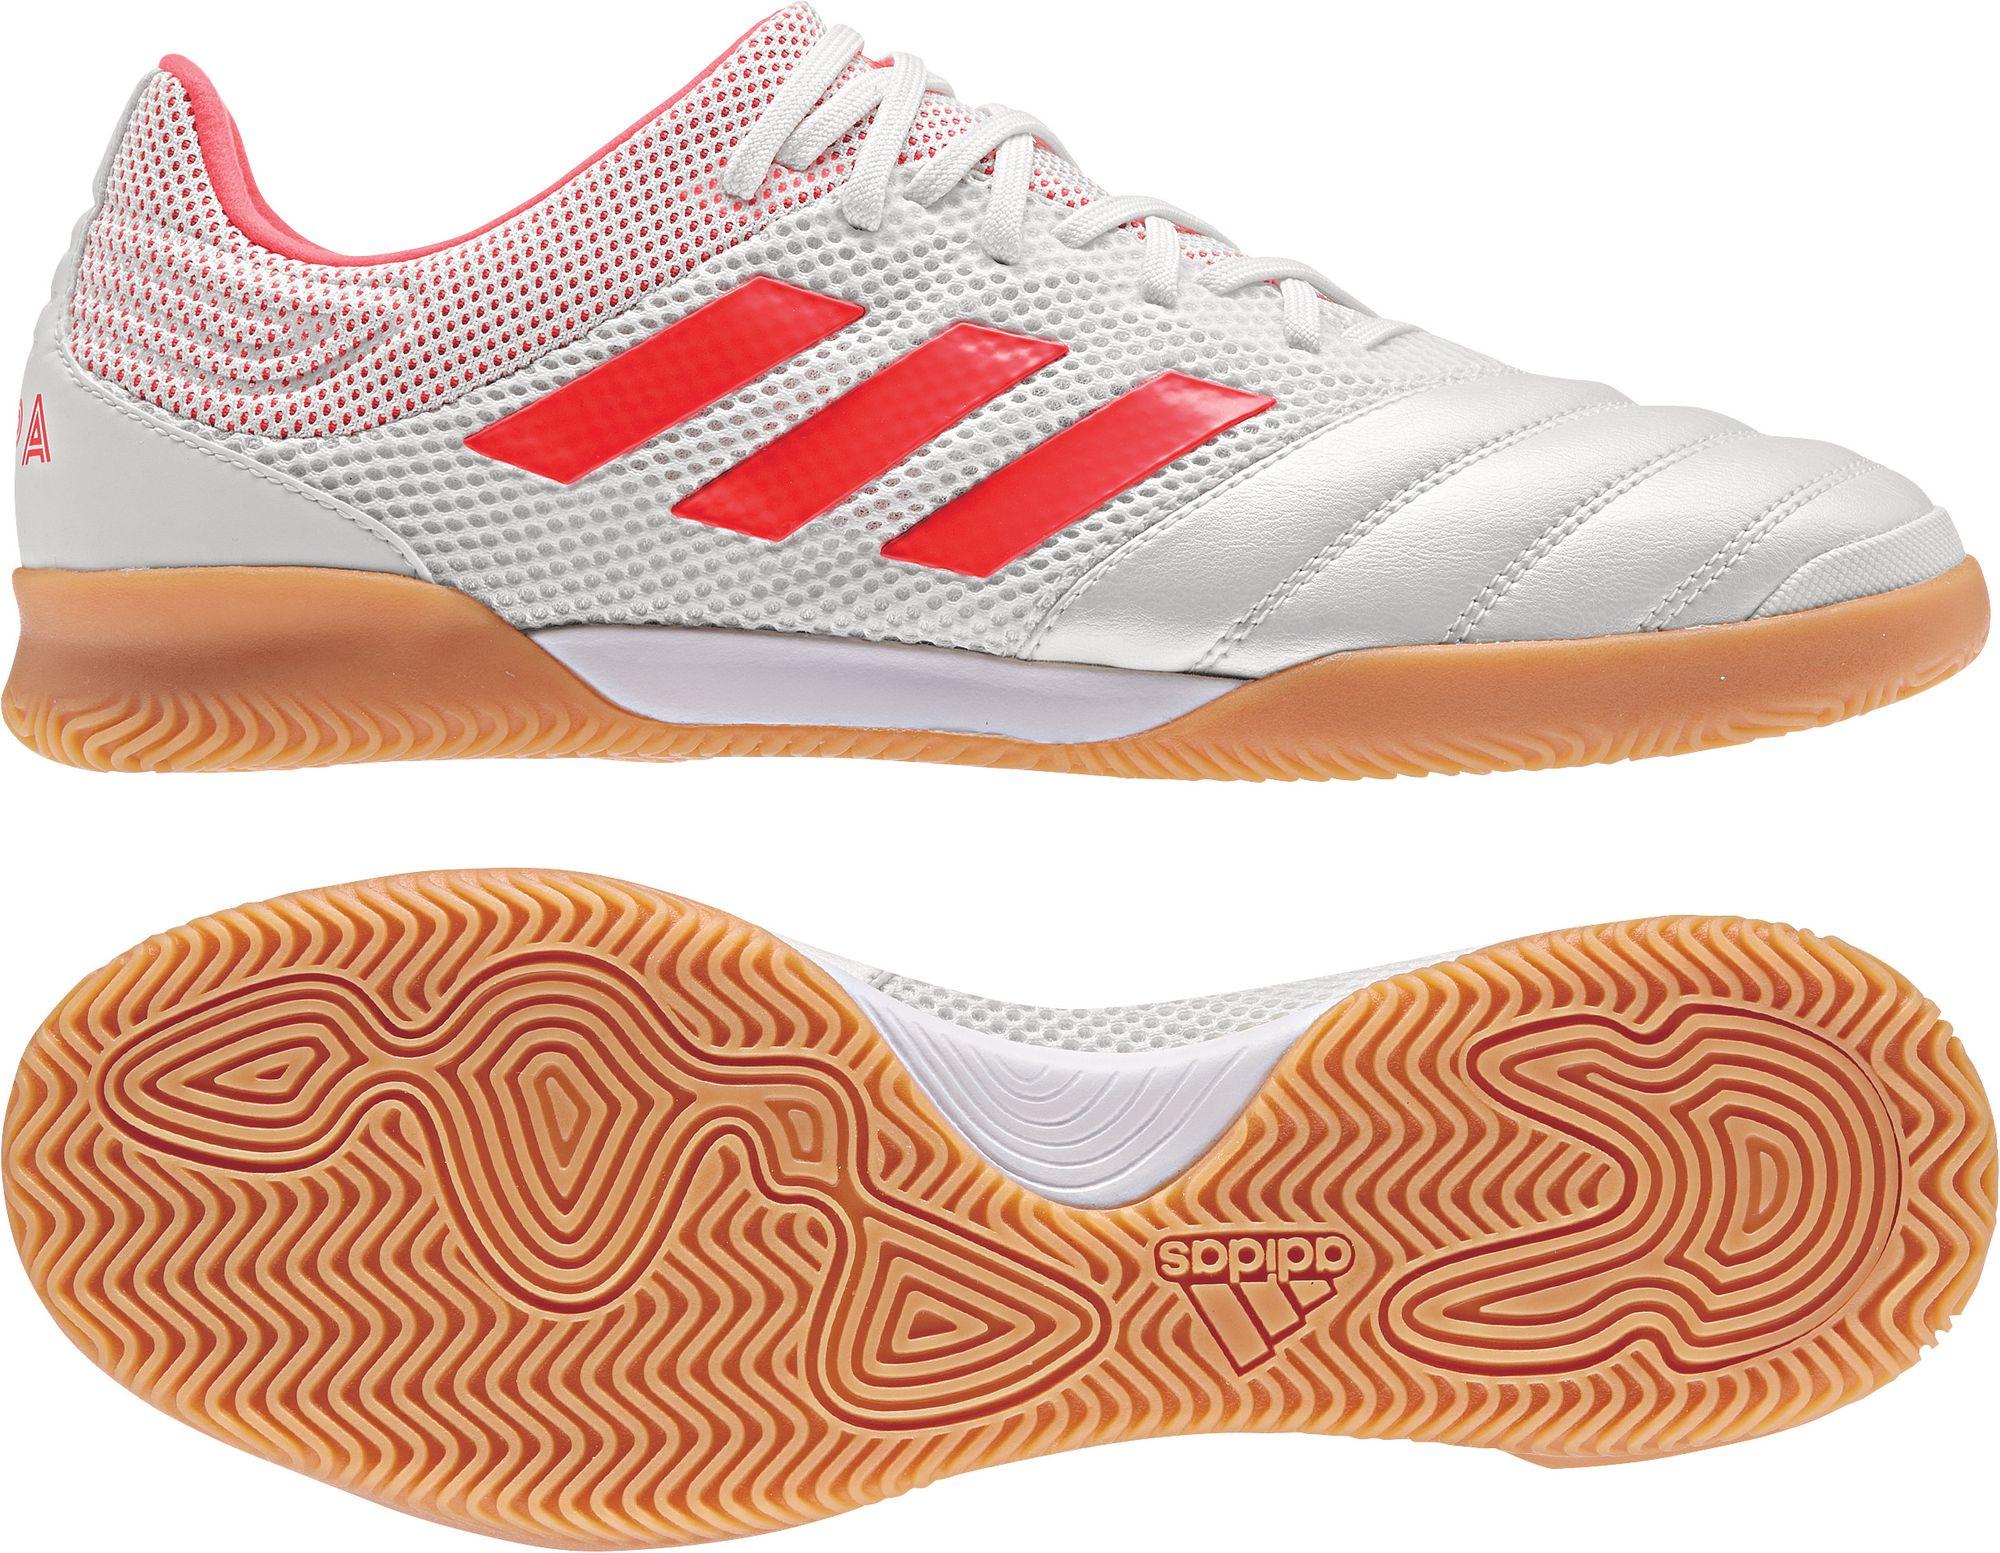 Adidas Copa Sala 19 3 In Hallenschuh Kinder